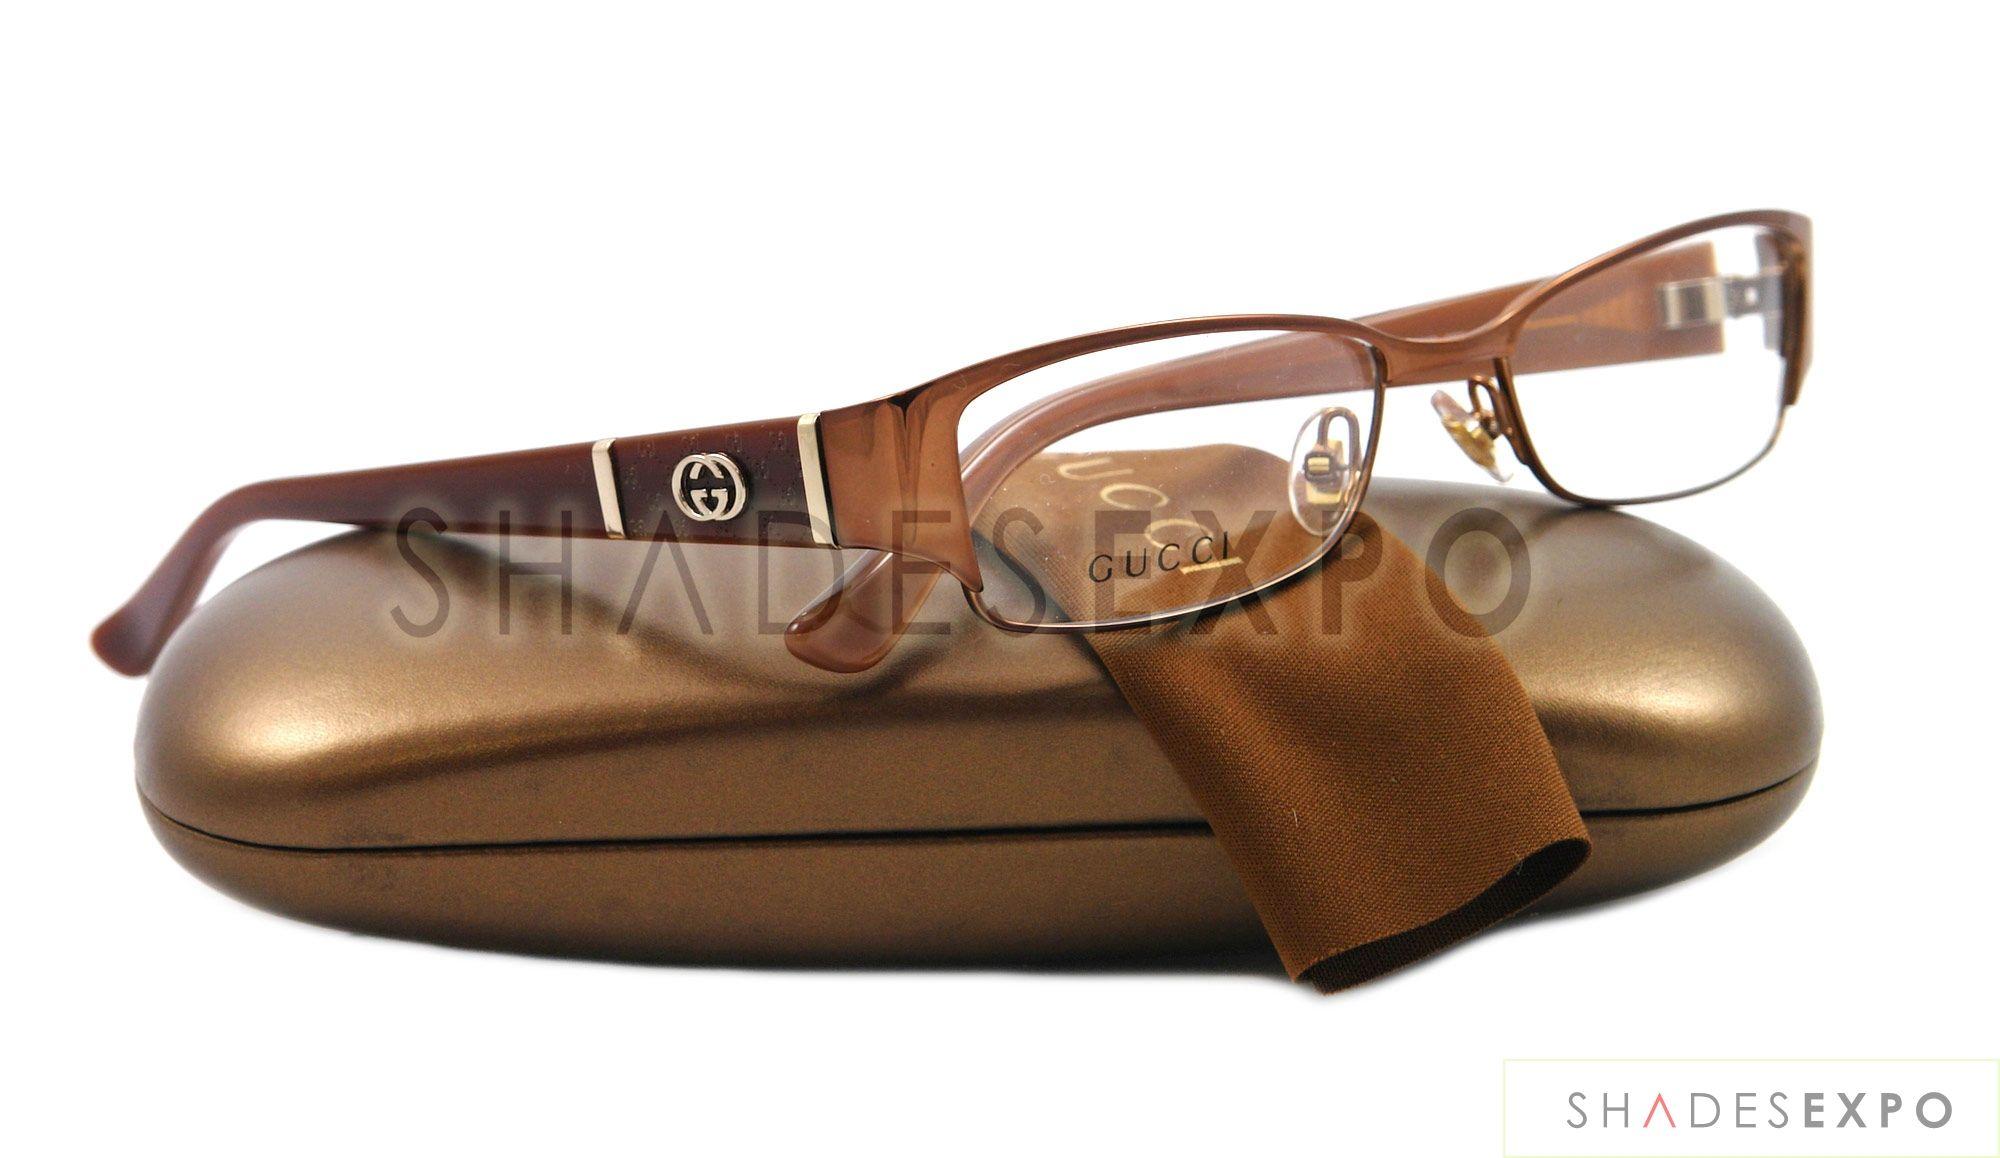 27121e3c4cb NEW Gucci Eyeglasses GG 2910 CARAMEL MI2 GG2910 52MM AUTH